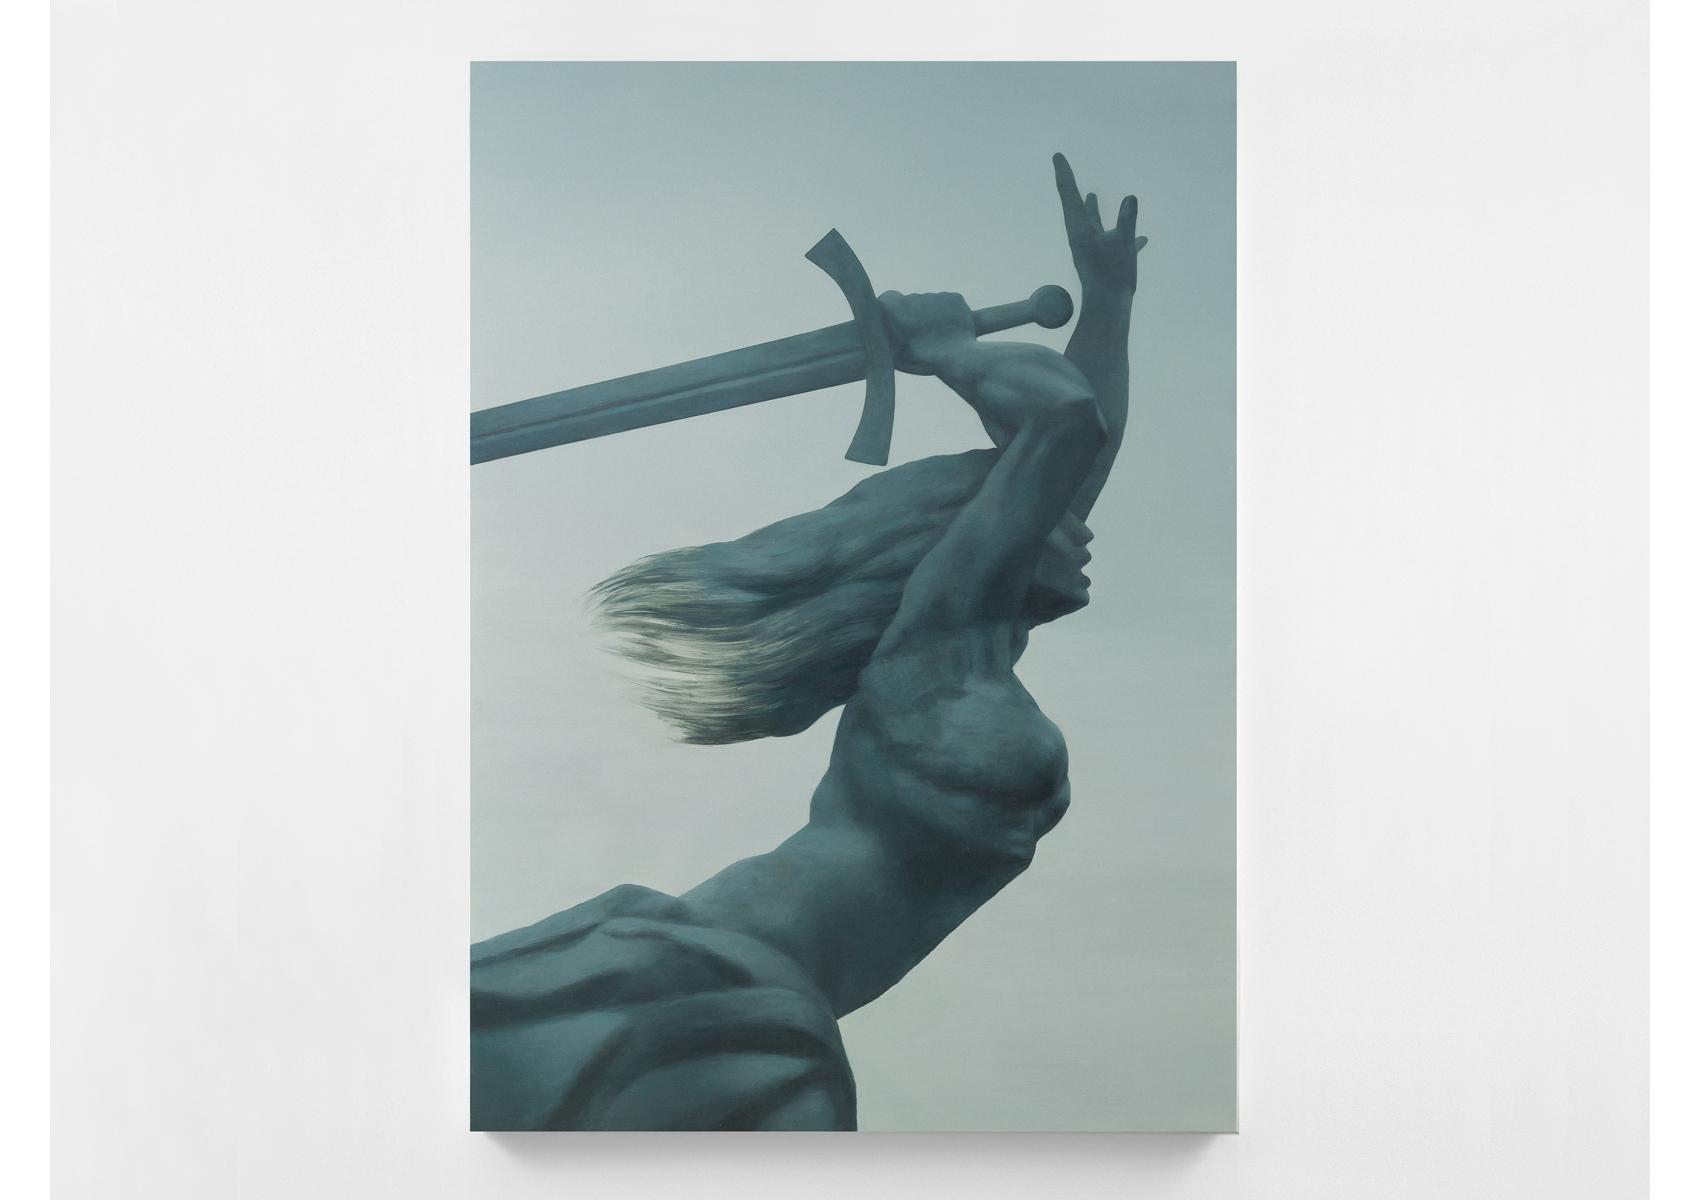 MONUMENT / Warszawa / 2014 / 140 x 200 x 4 cm /  oil on canvas